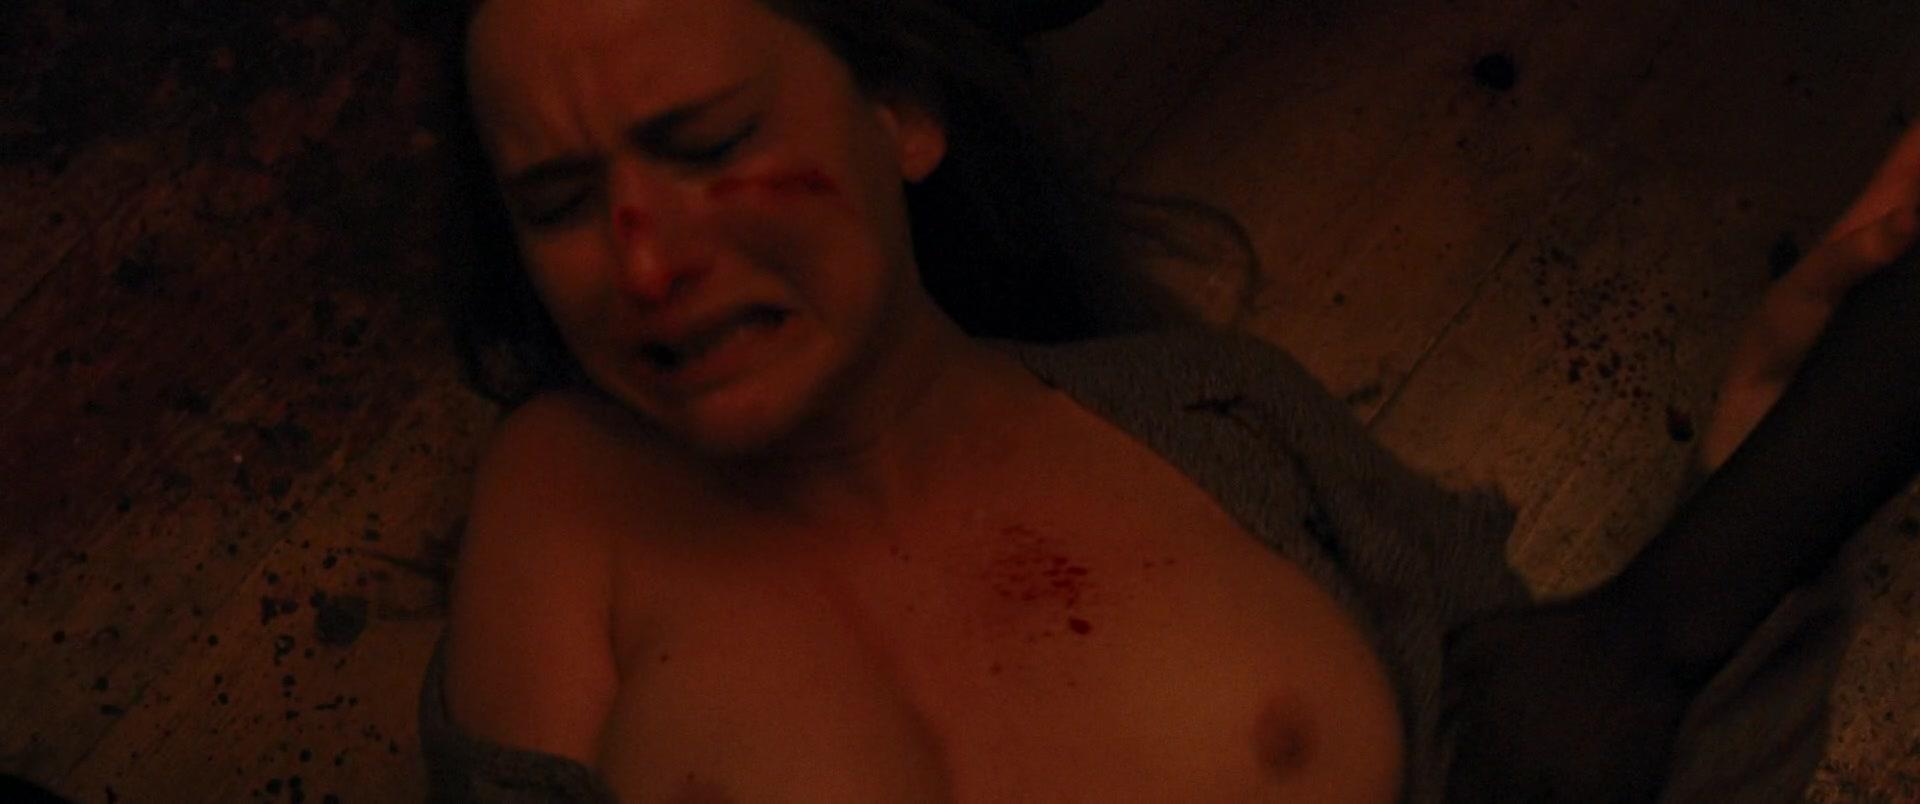 Jennifer-Lawrence-Michelle-Pfeiffer-Mother-41-thefappeningblog.com_.jpg